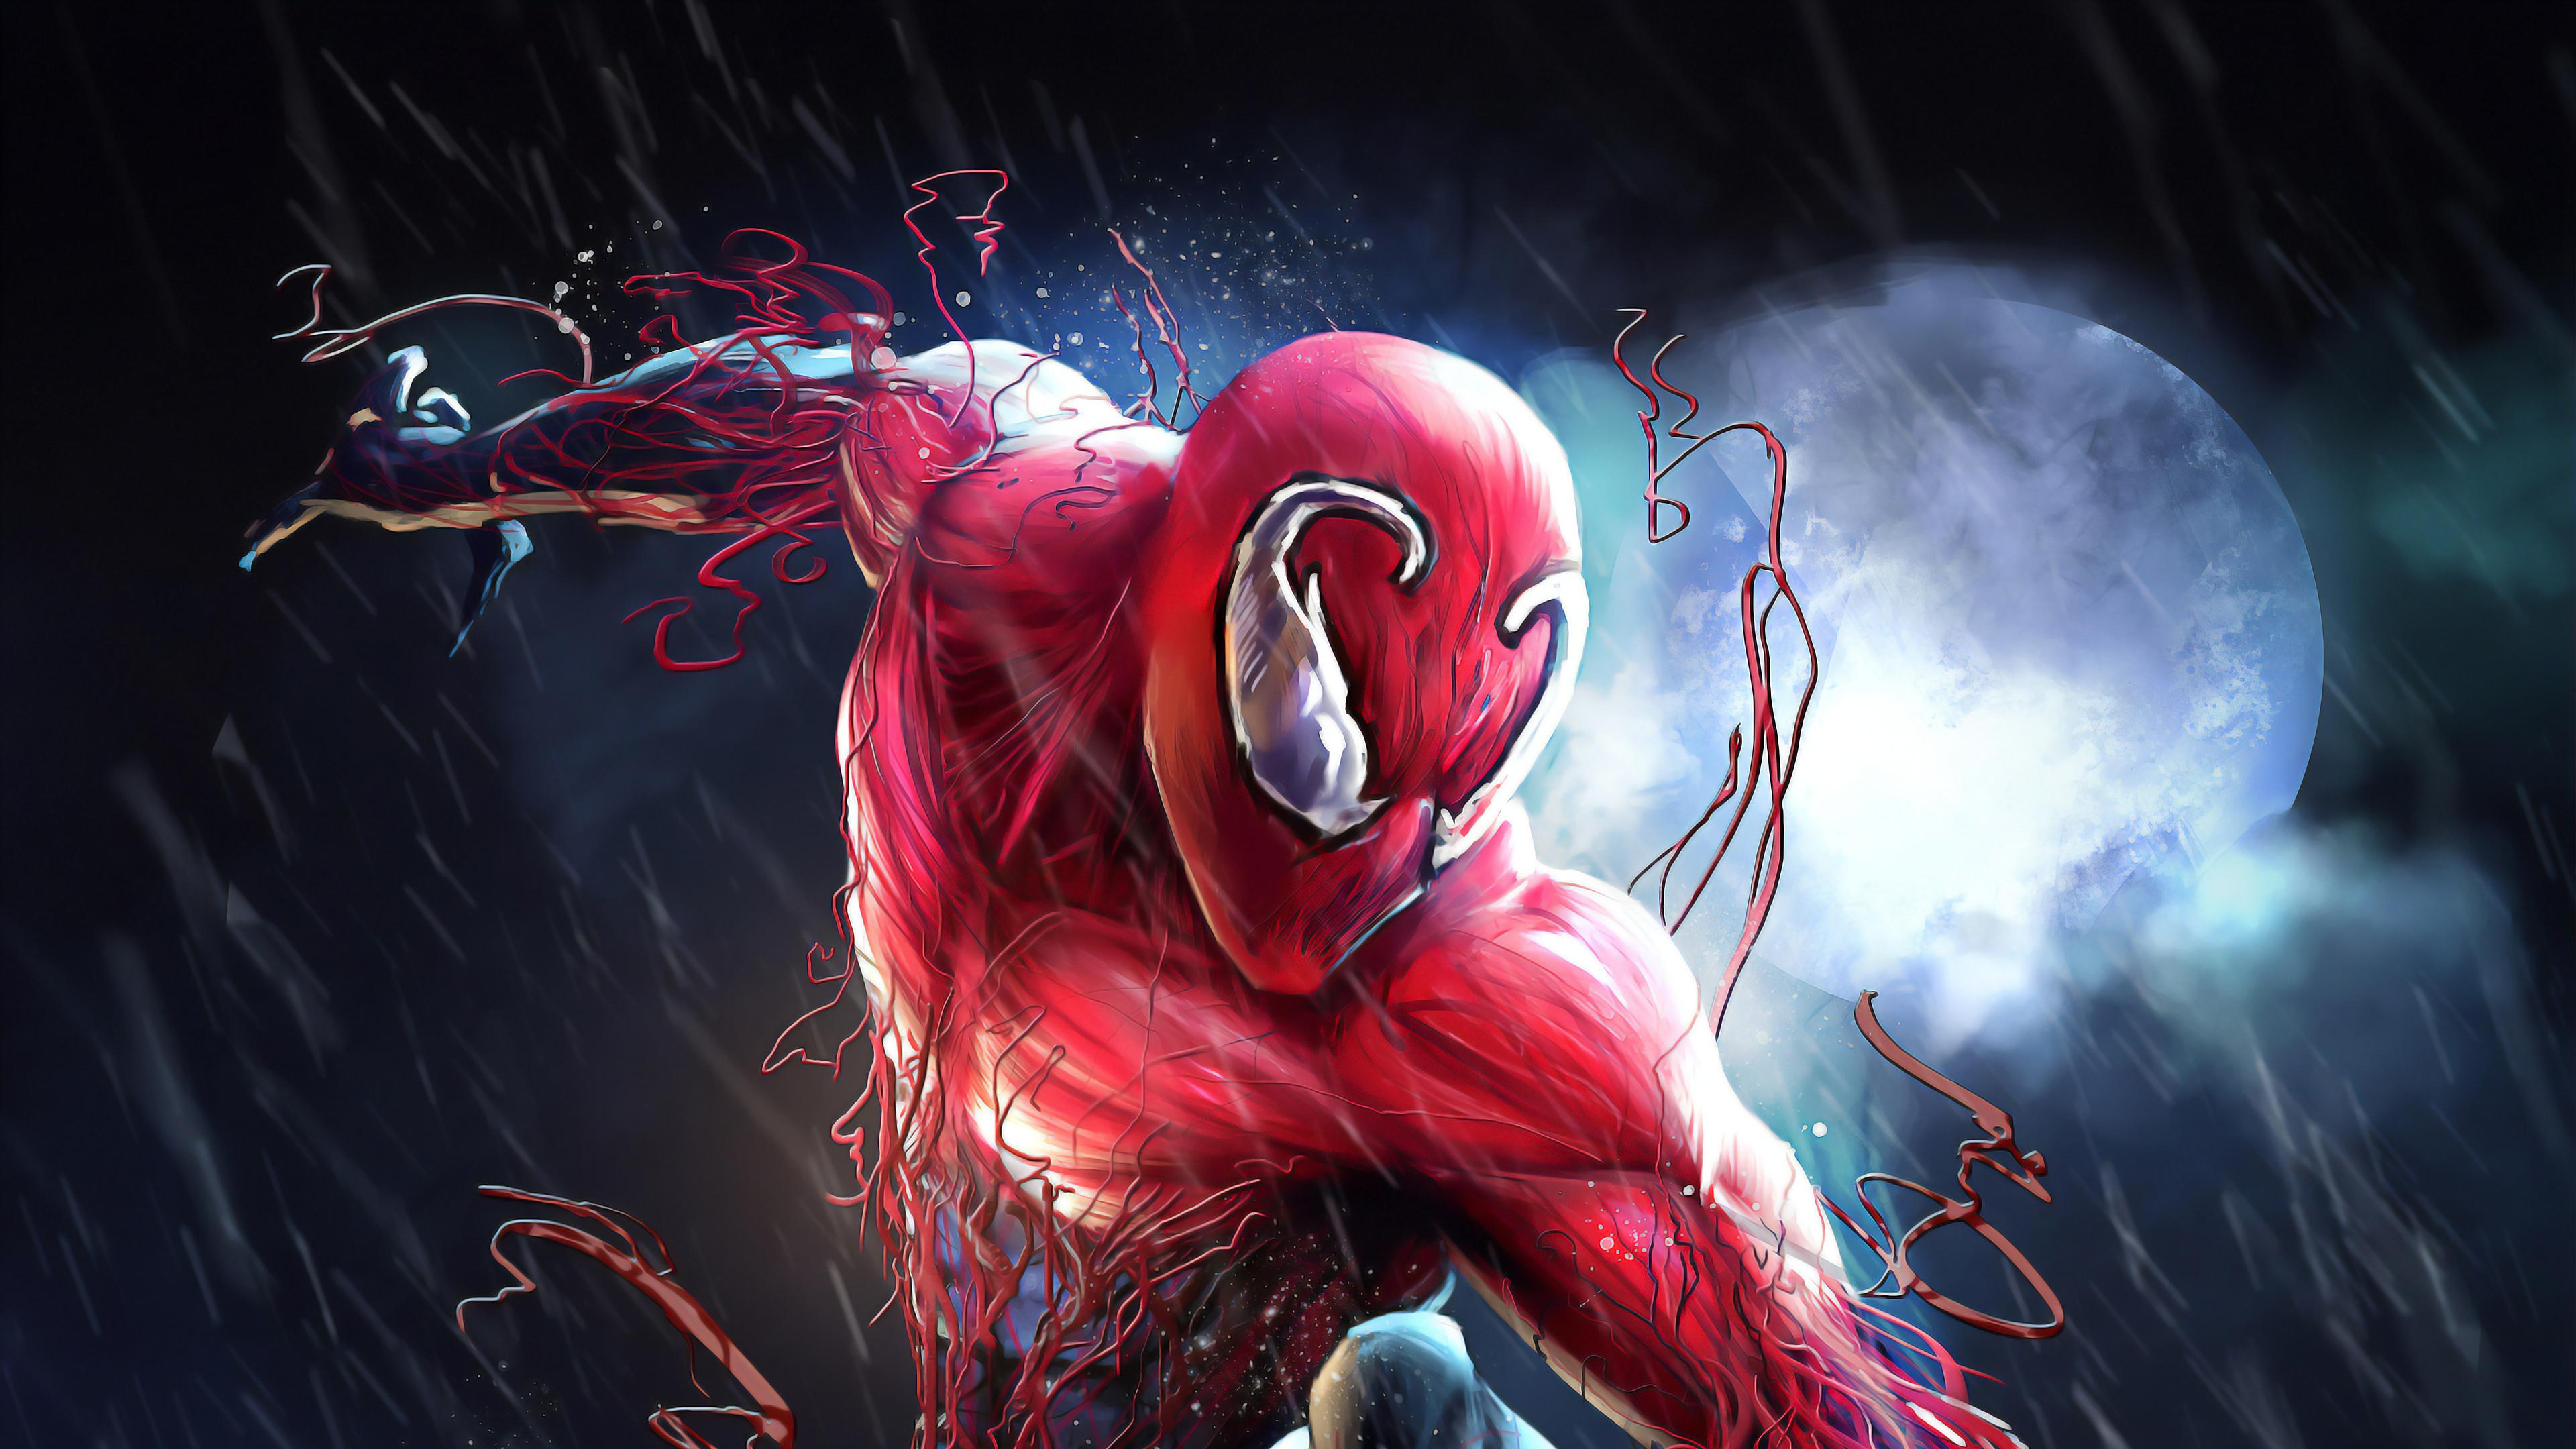 Toxin Spiderman 4k, HD Superheroes, 4k Wallpapers, Images ...